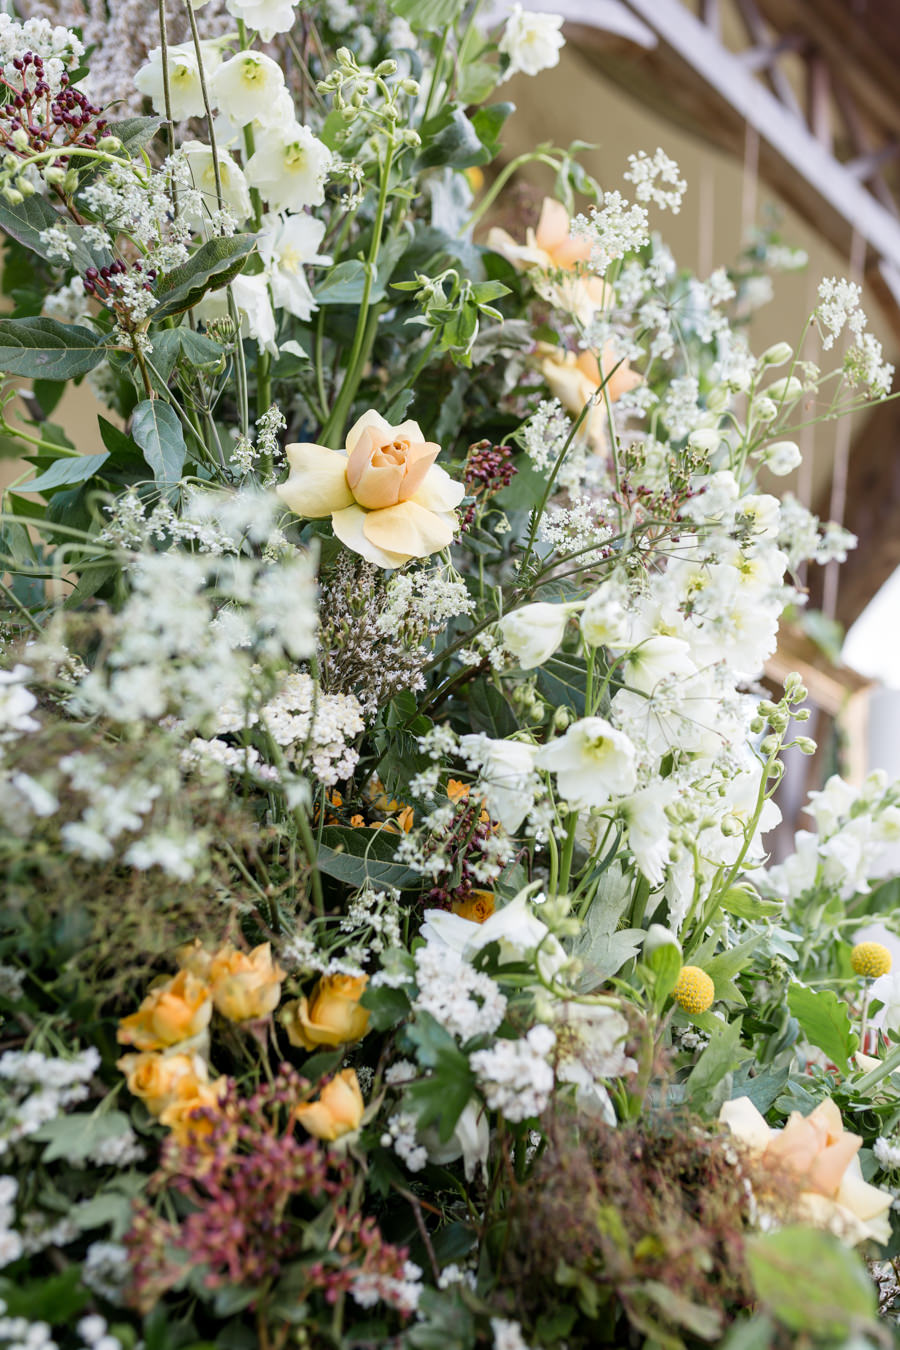 Boho luxe wedding style with soft orange and muted tones at Chippenham, image credit Heather Jackson Photography (9)